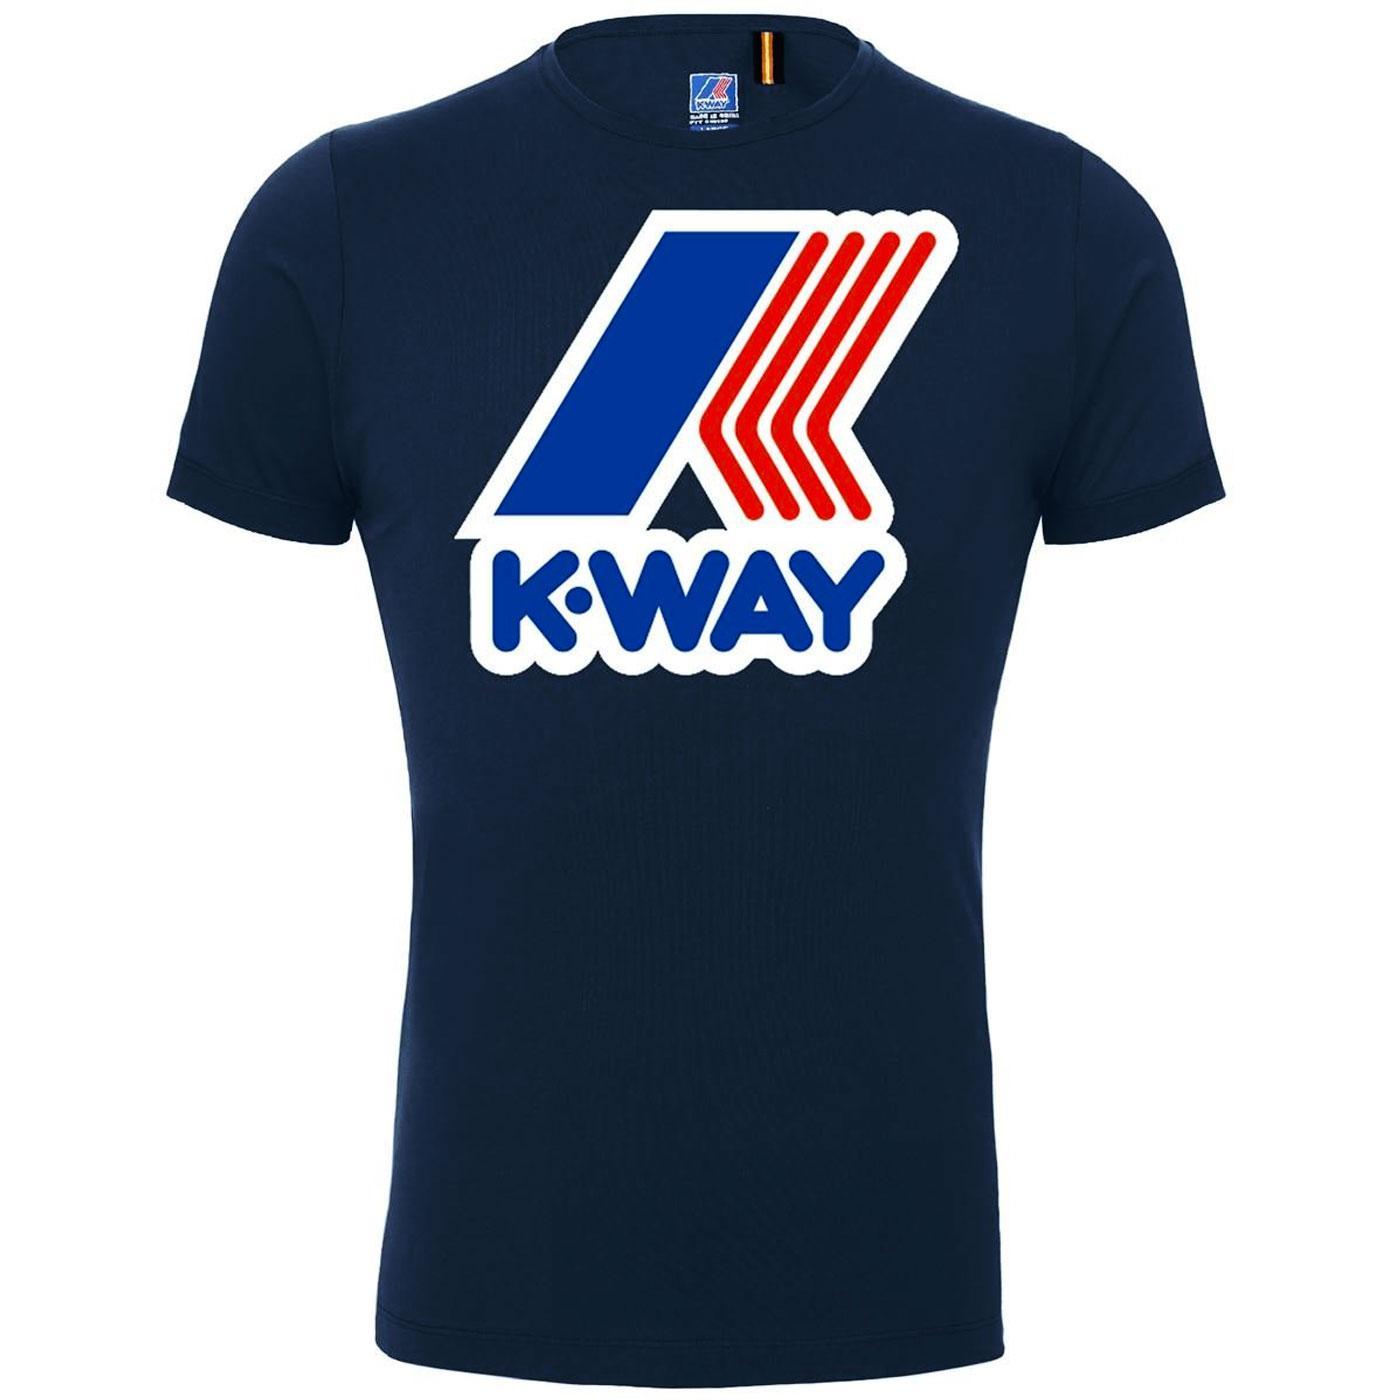 K-WAY Pete Macro Logo Retro 80s Tee (Blue Depths)